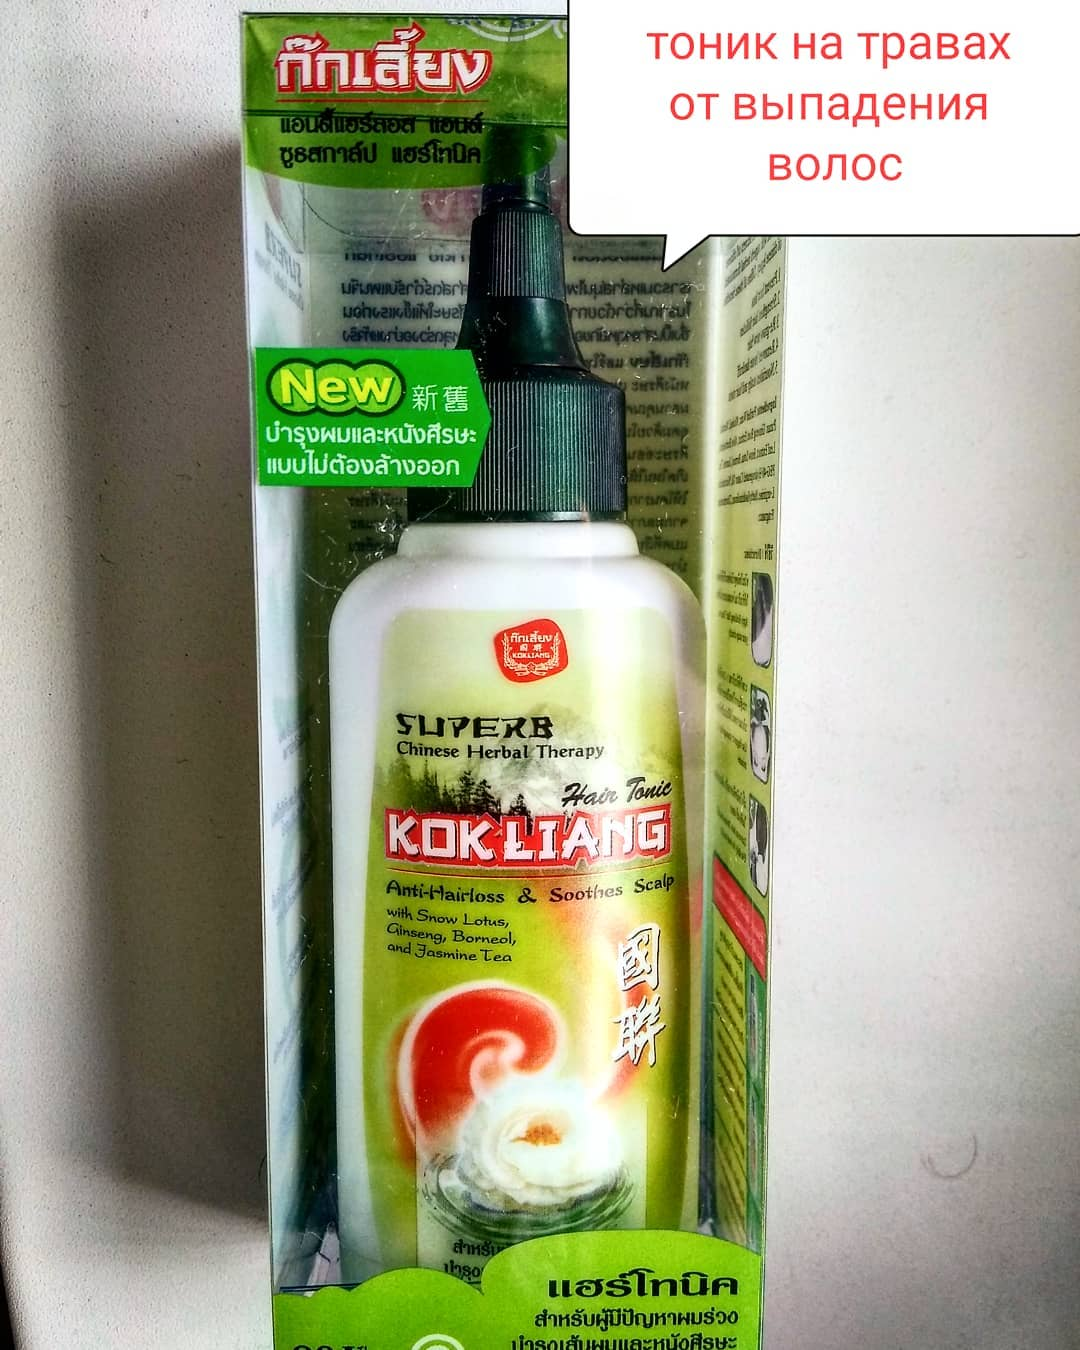 Тоник от выпадения волос KokLiang 80 мл